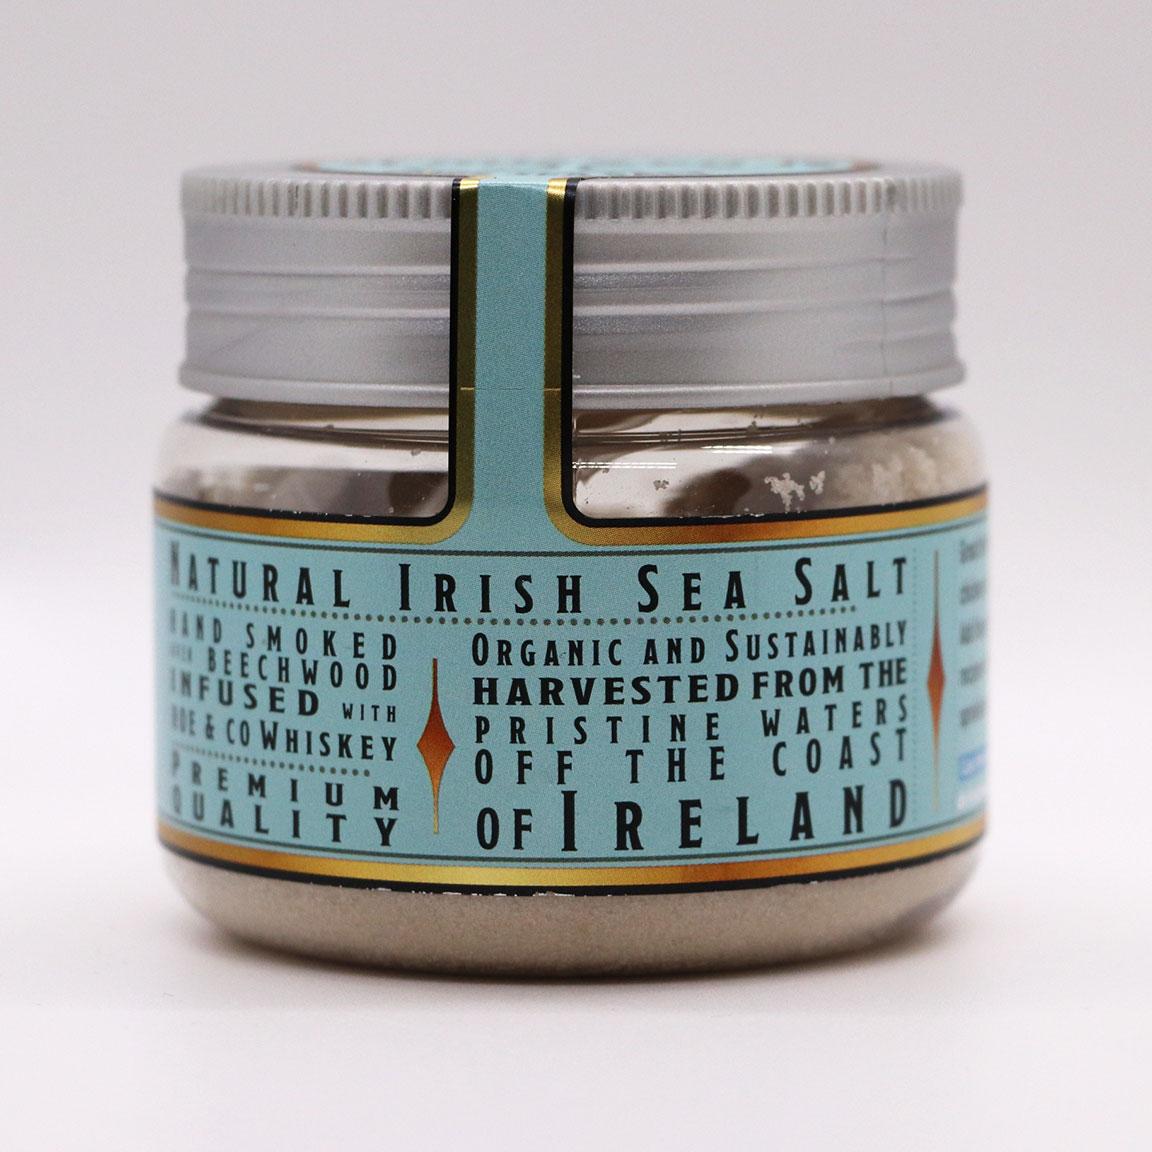 Oriel Irish Sea Salt Roe & Co Whiskey Smoked